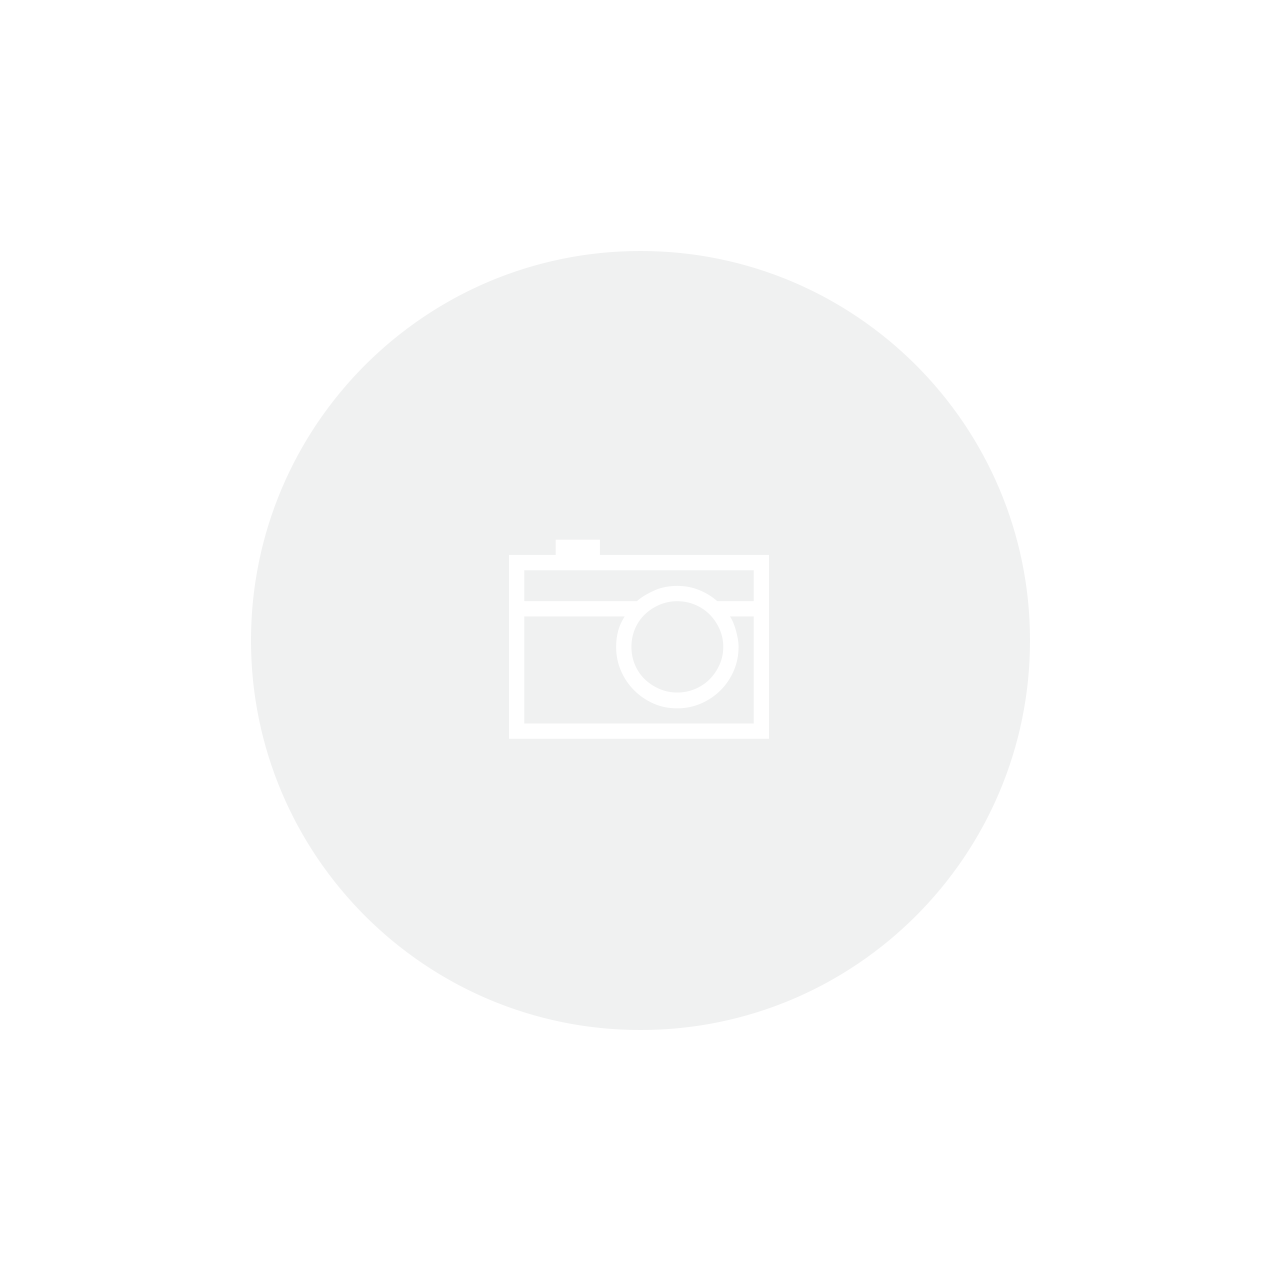 Bandeja Redonda Inox Cobre 35 cm